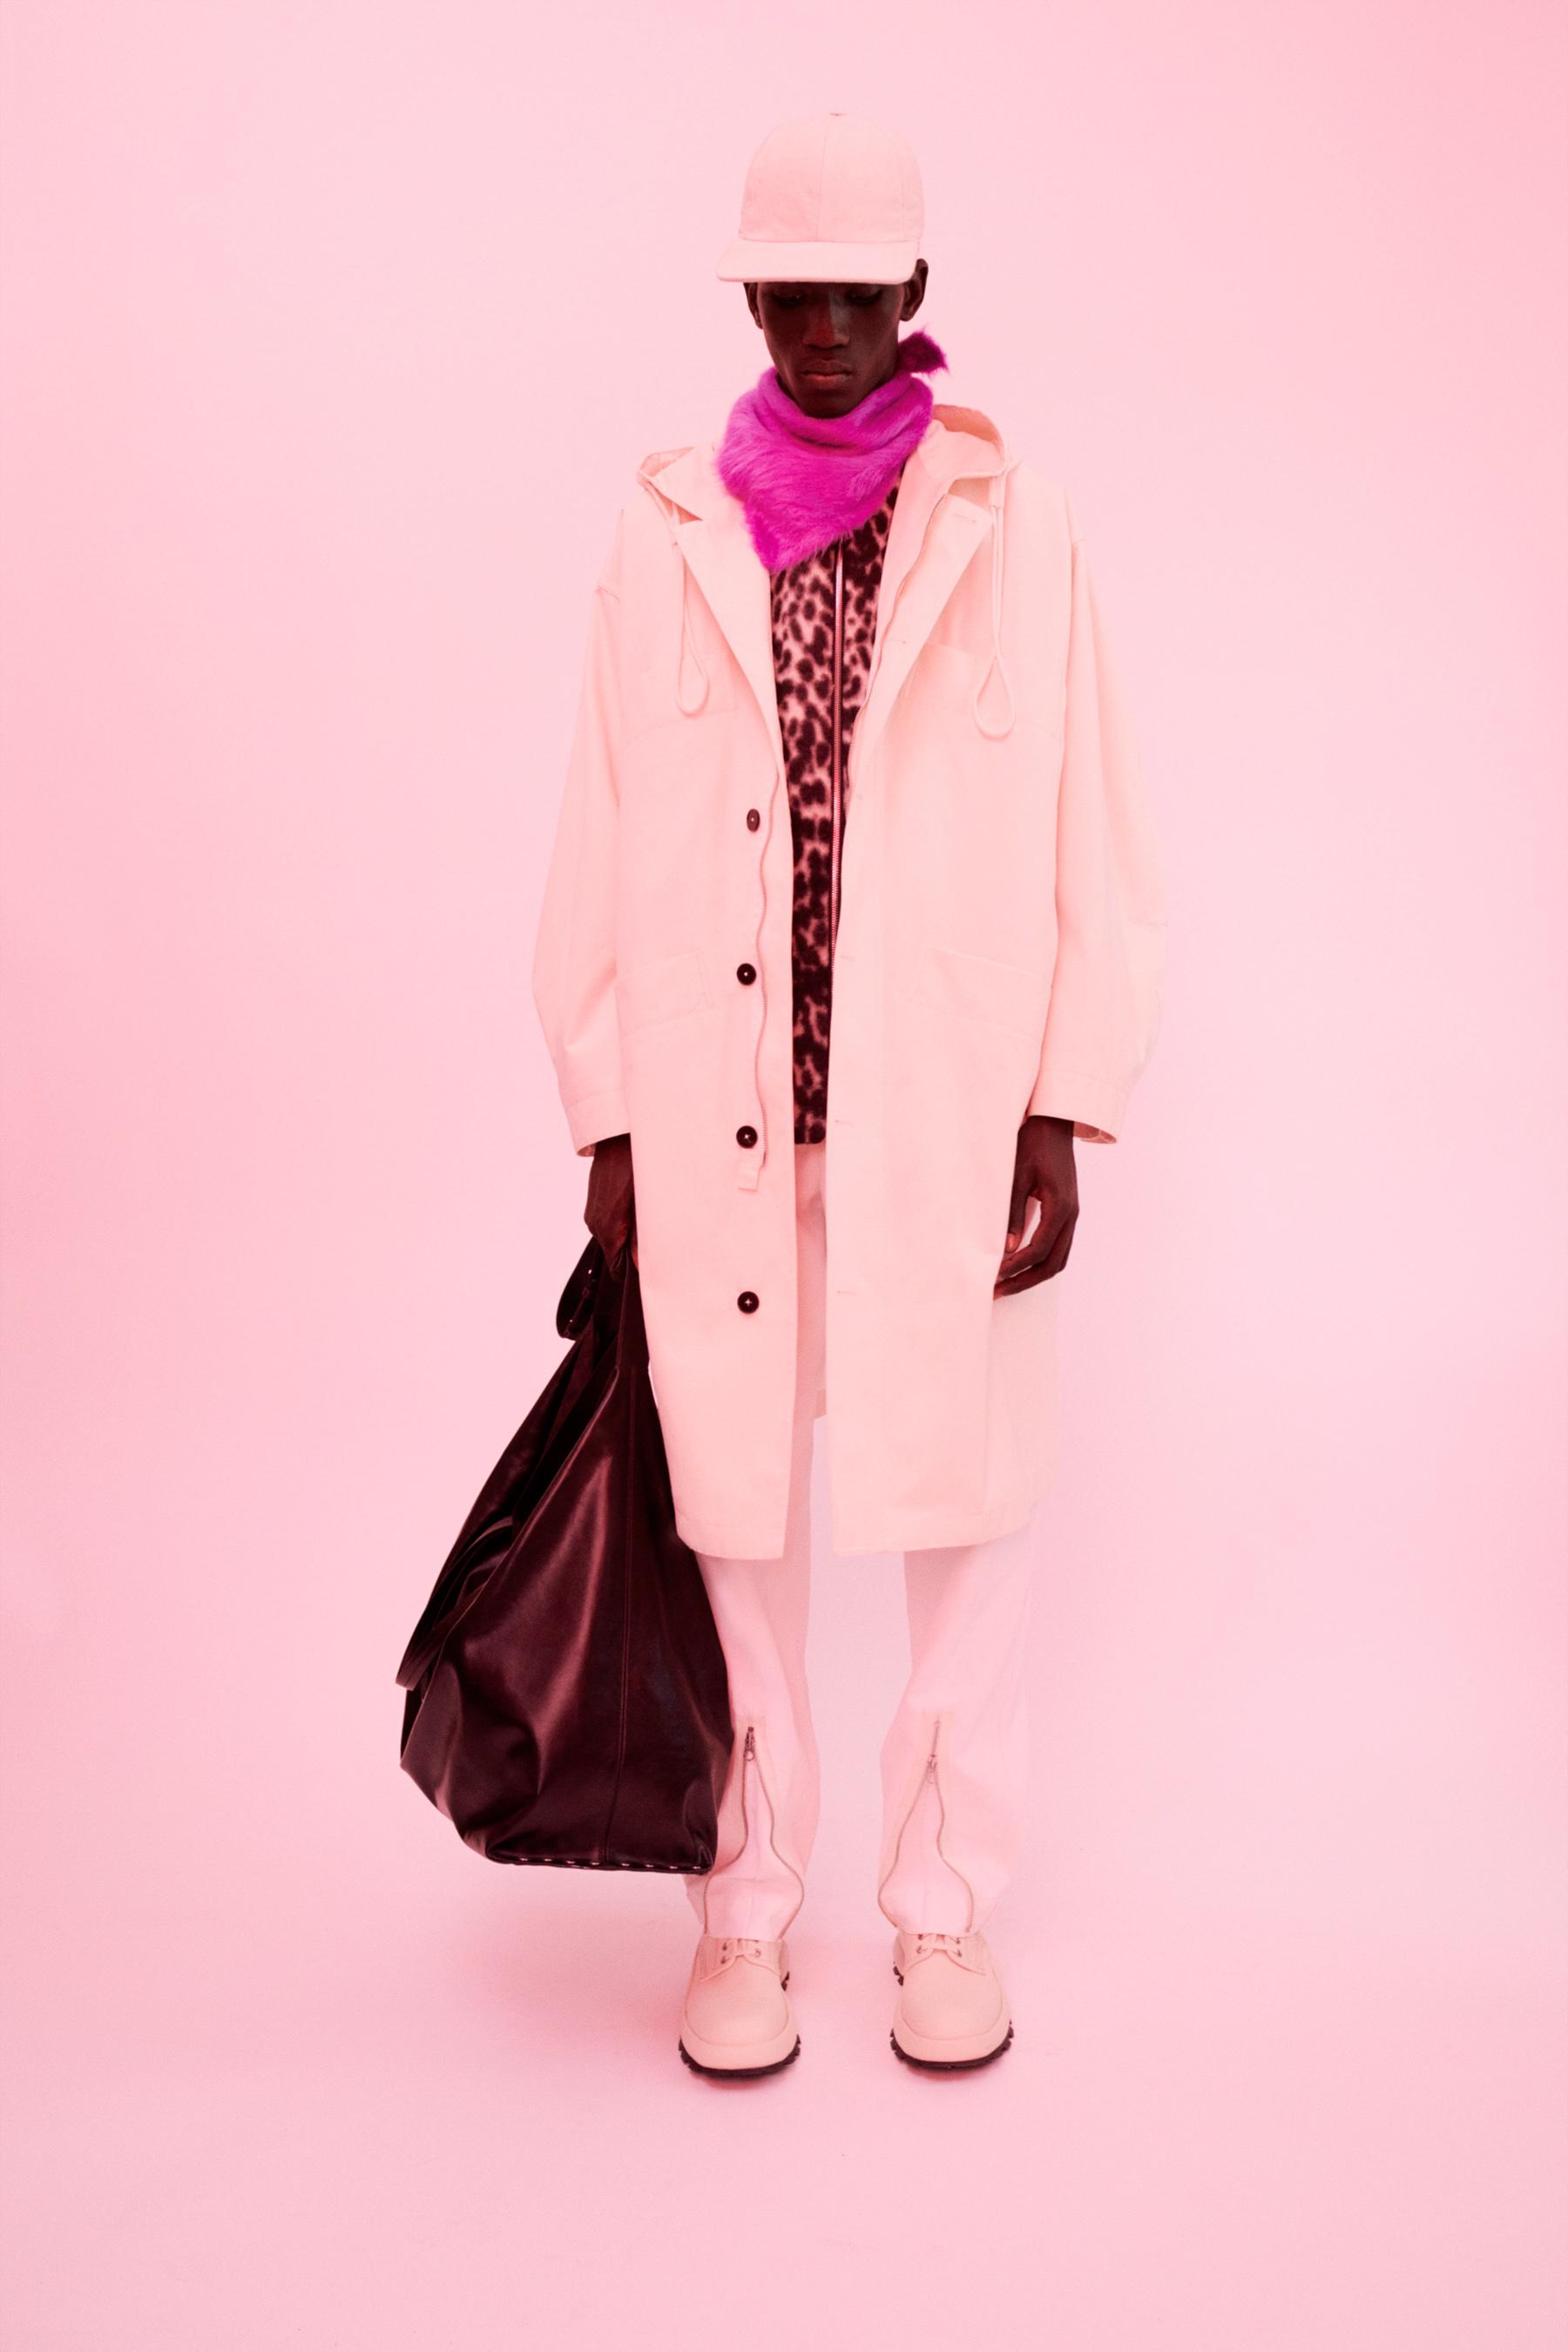 Jil Sander Spring 2022 Men's  Fashion Show